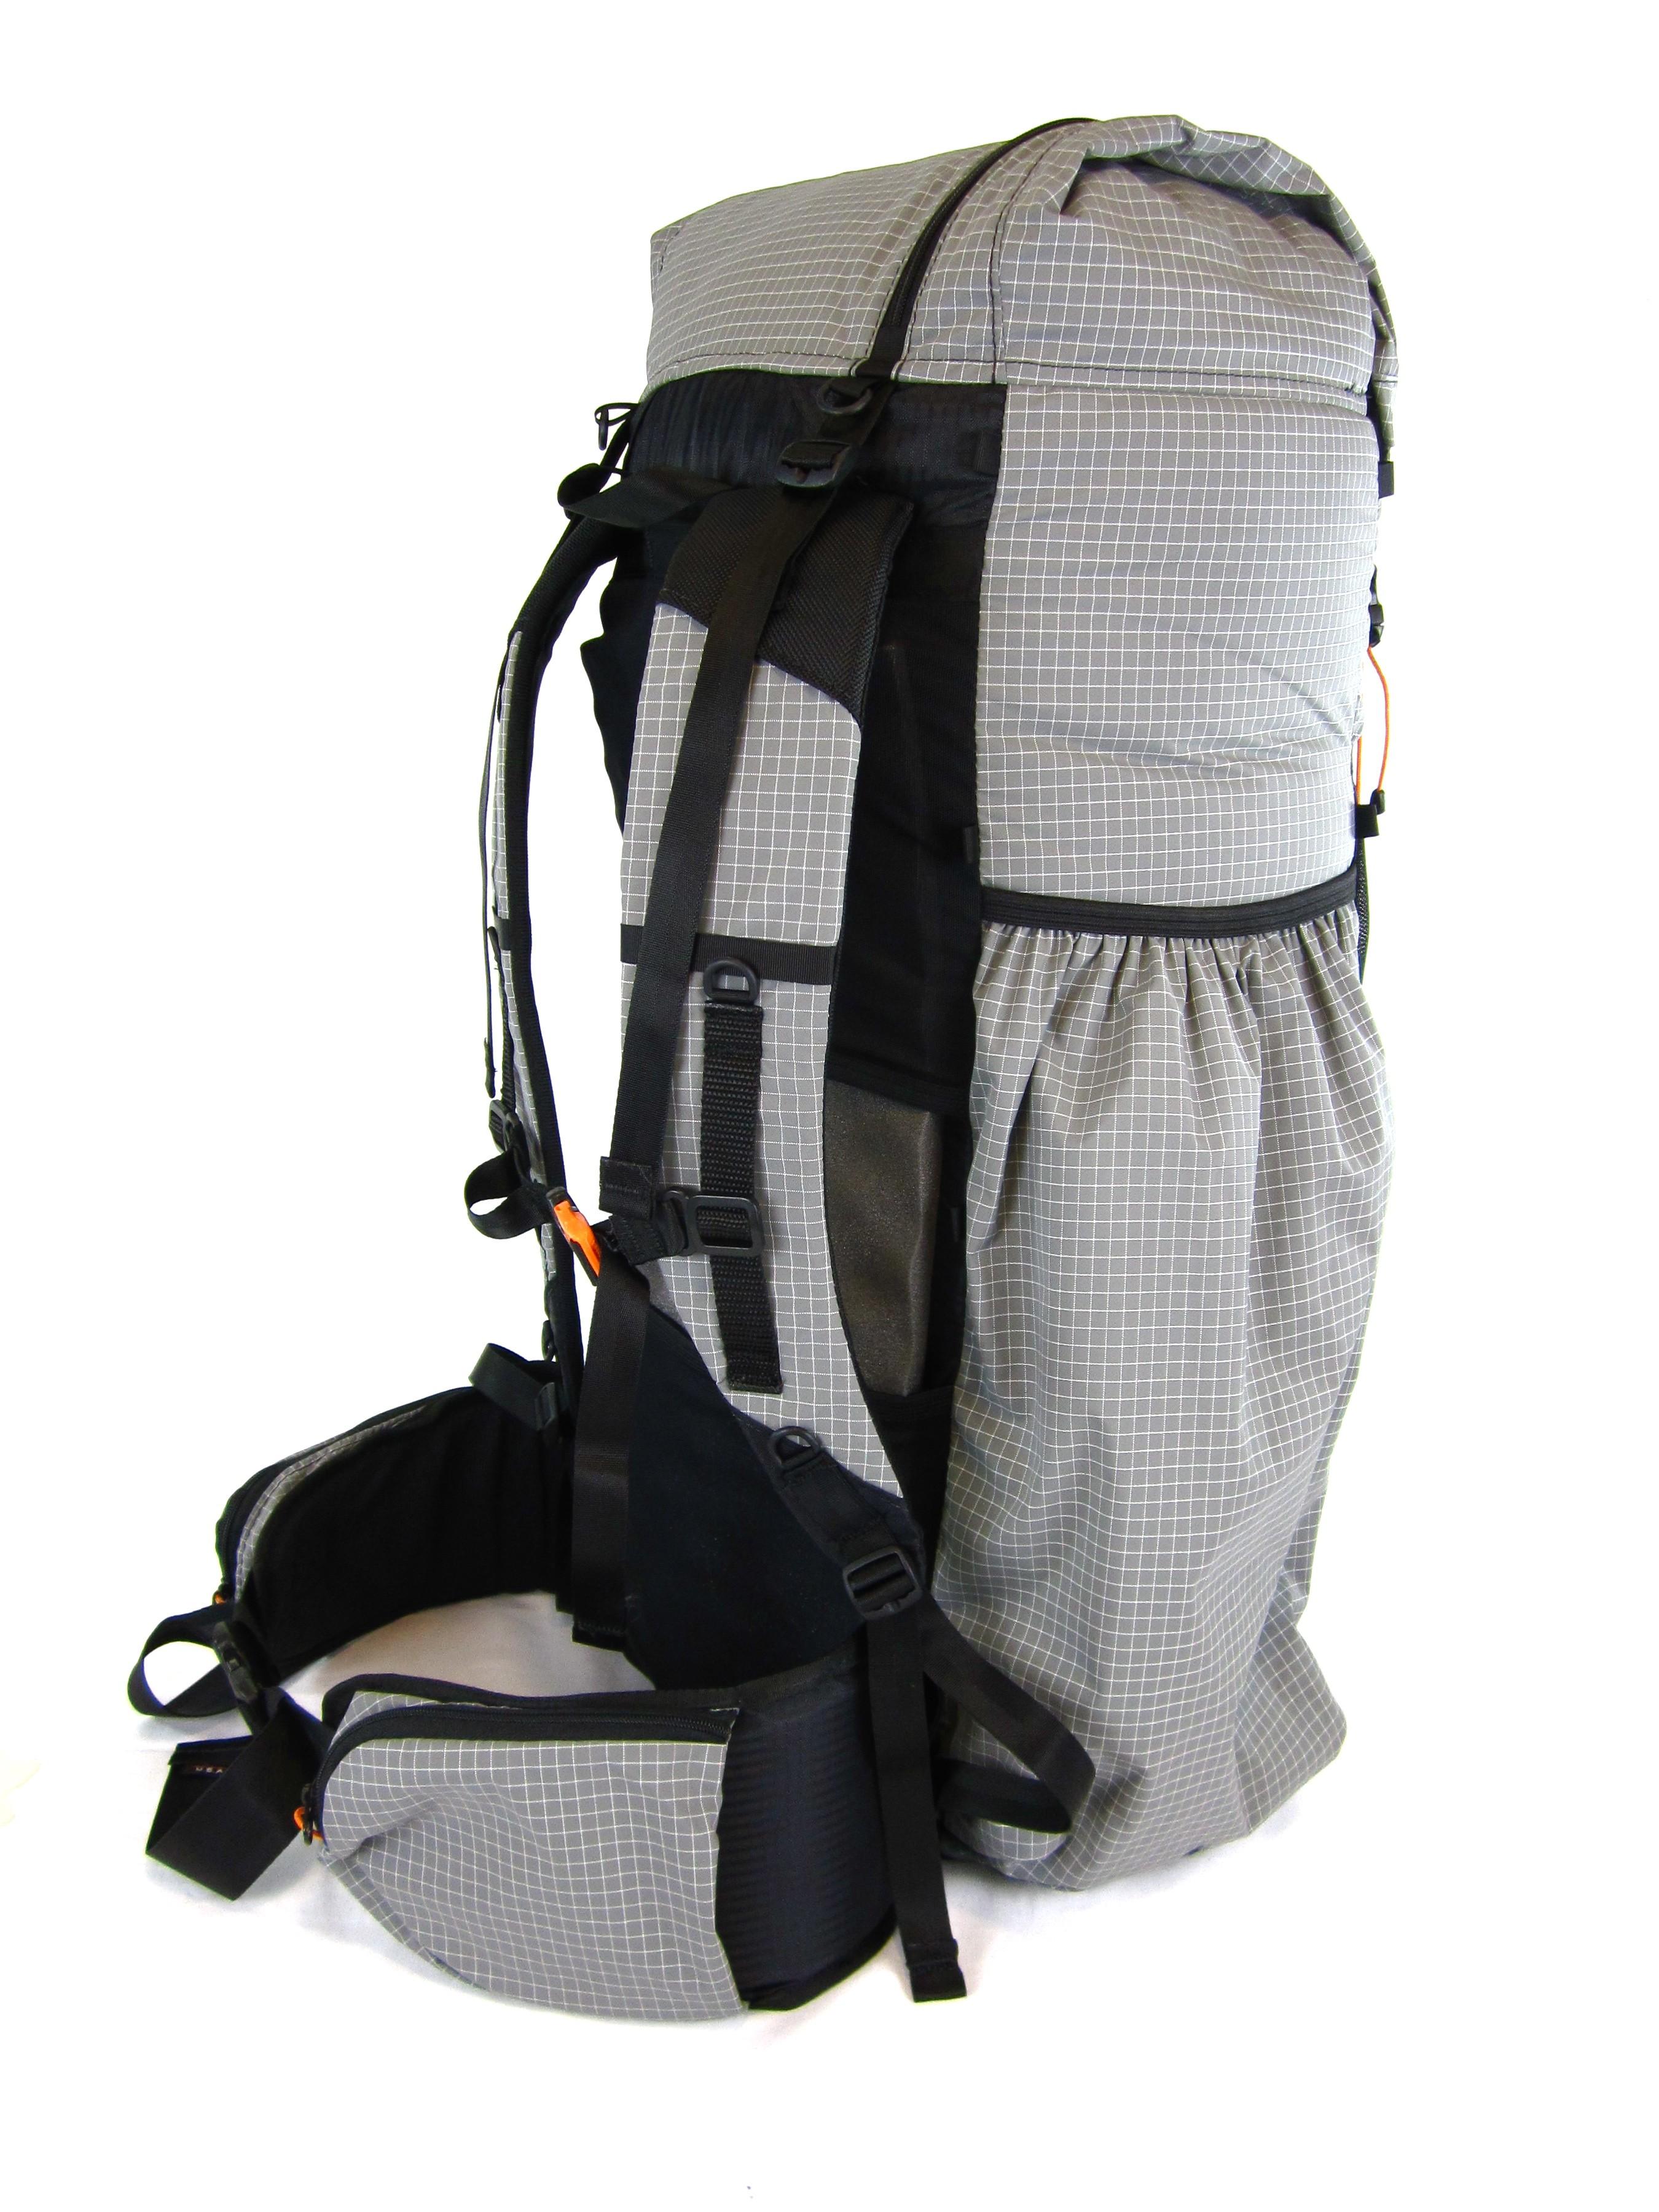 Gossamer Gear Mariposa Backpack